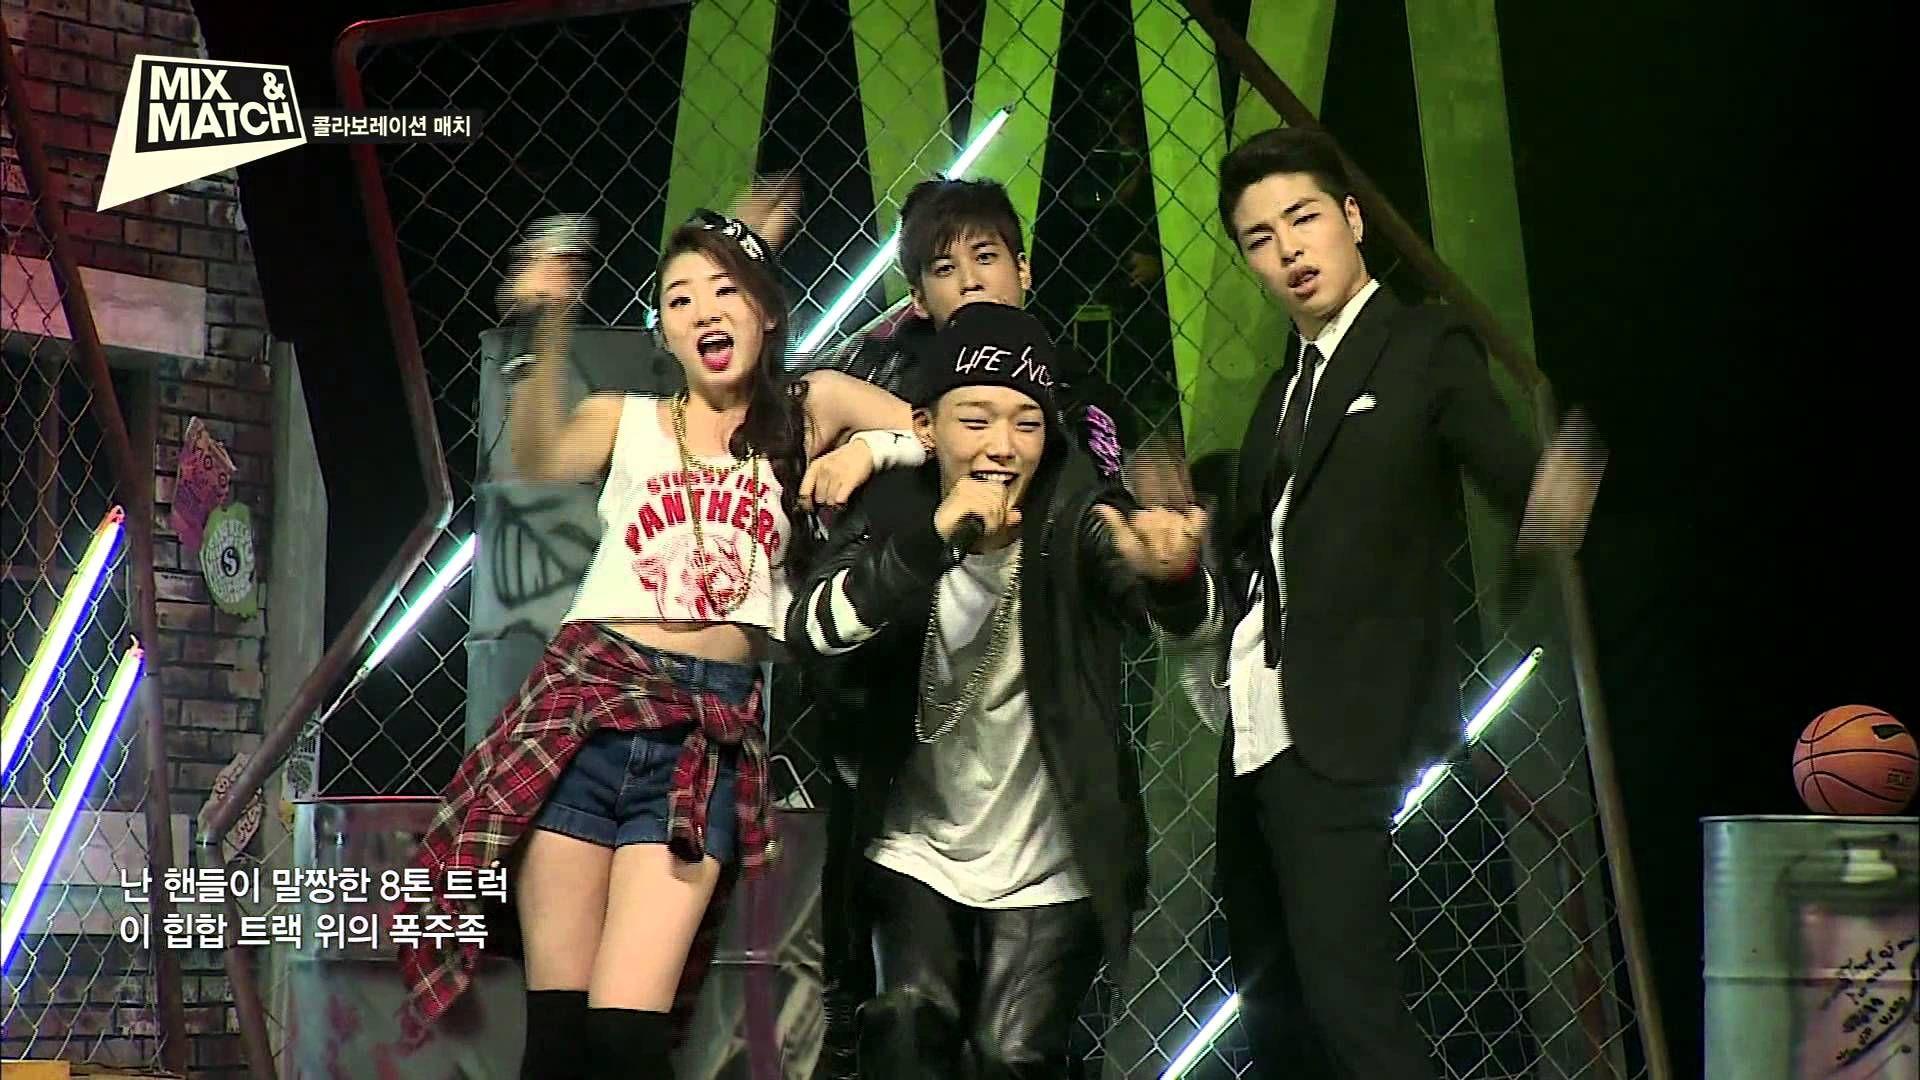 Engsub Mix Match Ep 5 Bobby Junhoe Chanwoo Ft Hanna Jang